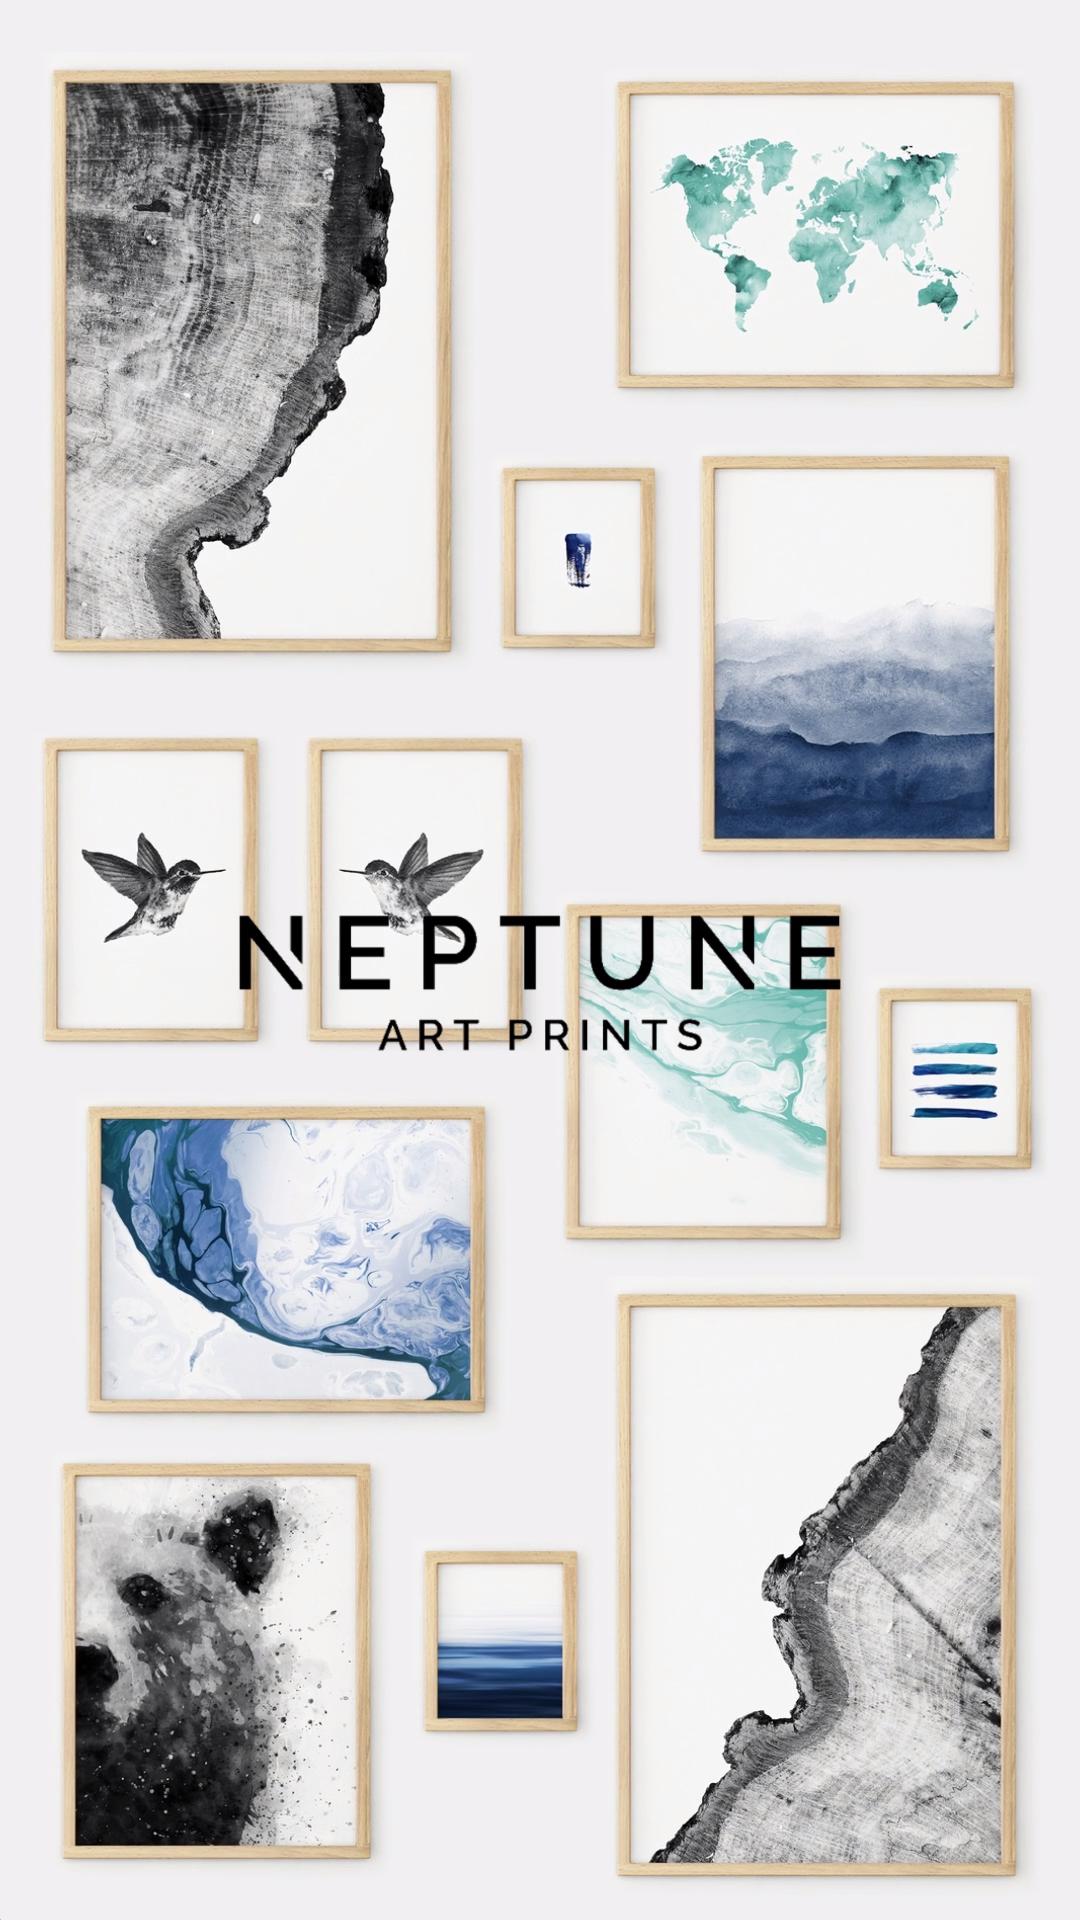 Free Printable Wall Art by Neptune Art Prints